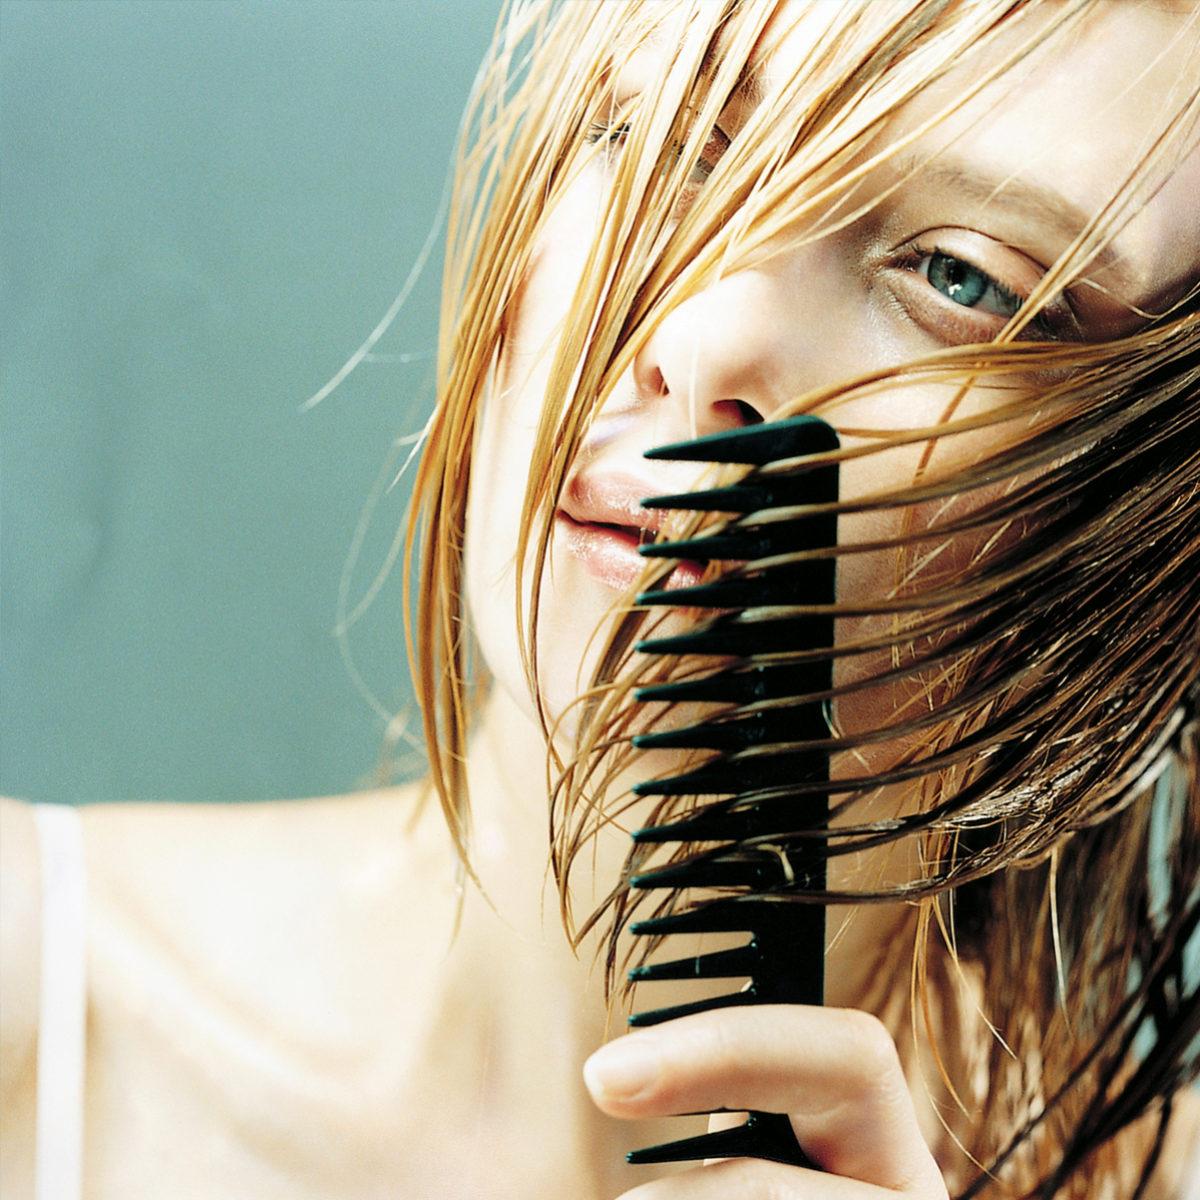 Vino lavarse de el pelo con vinagre